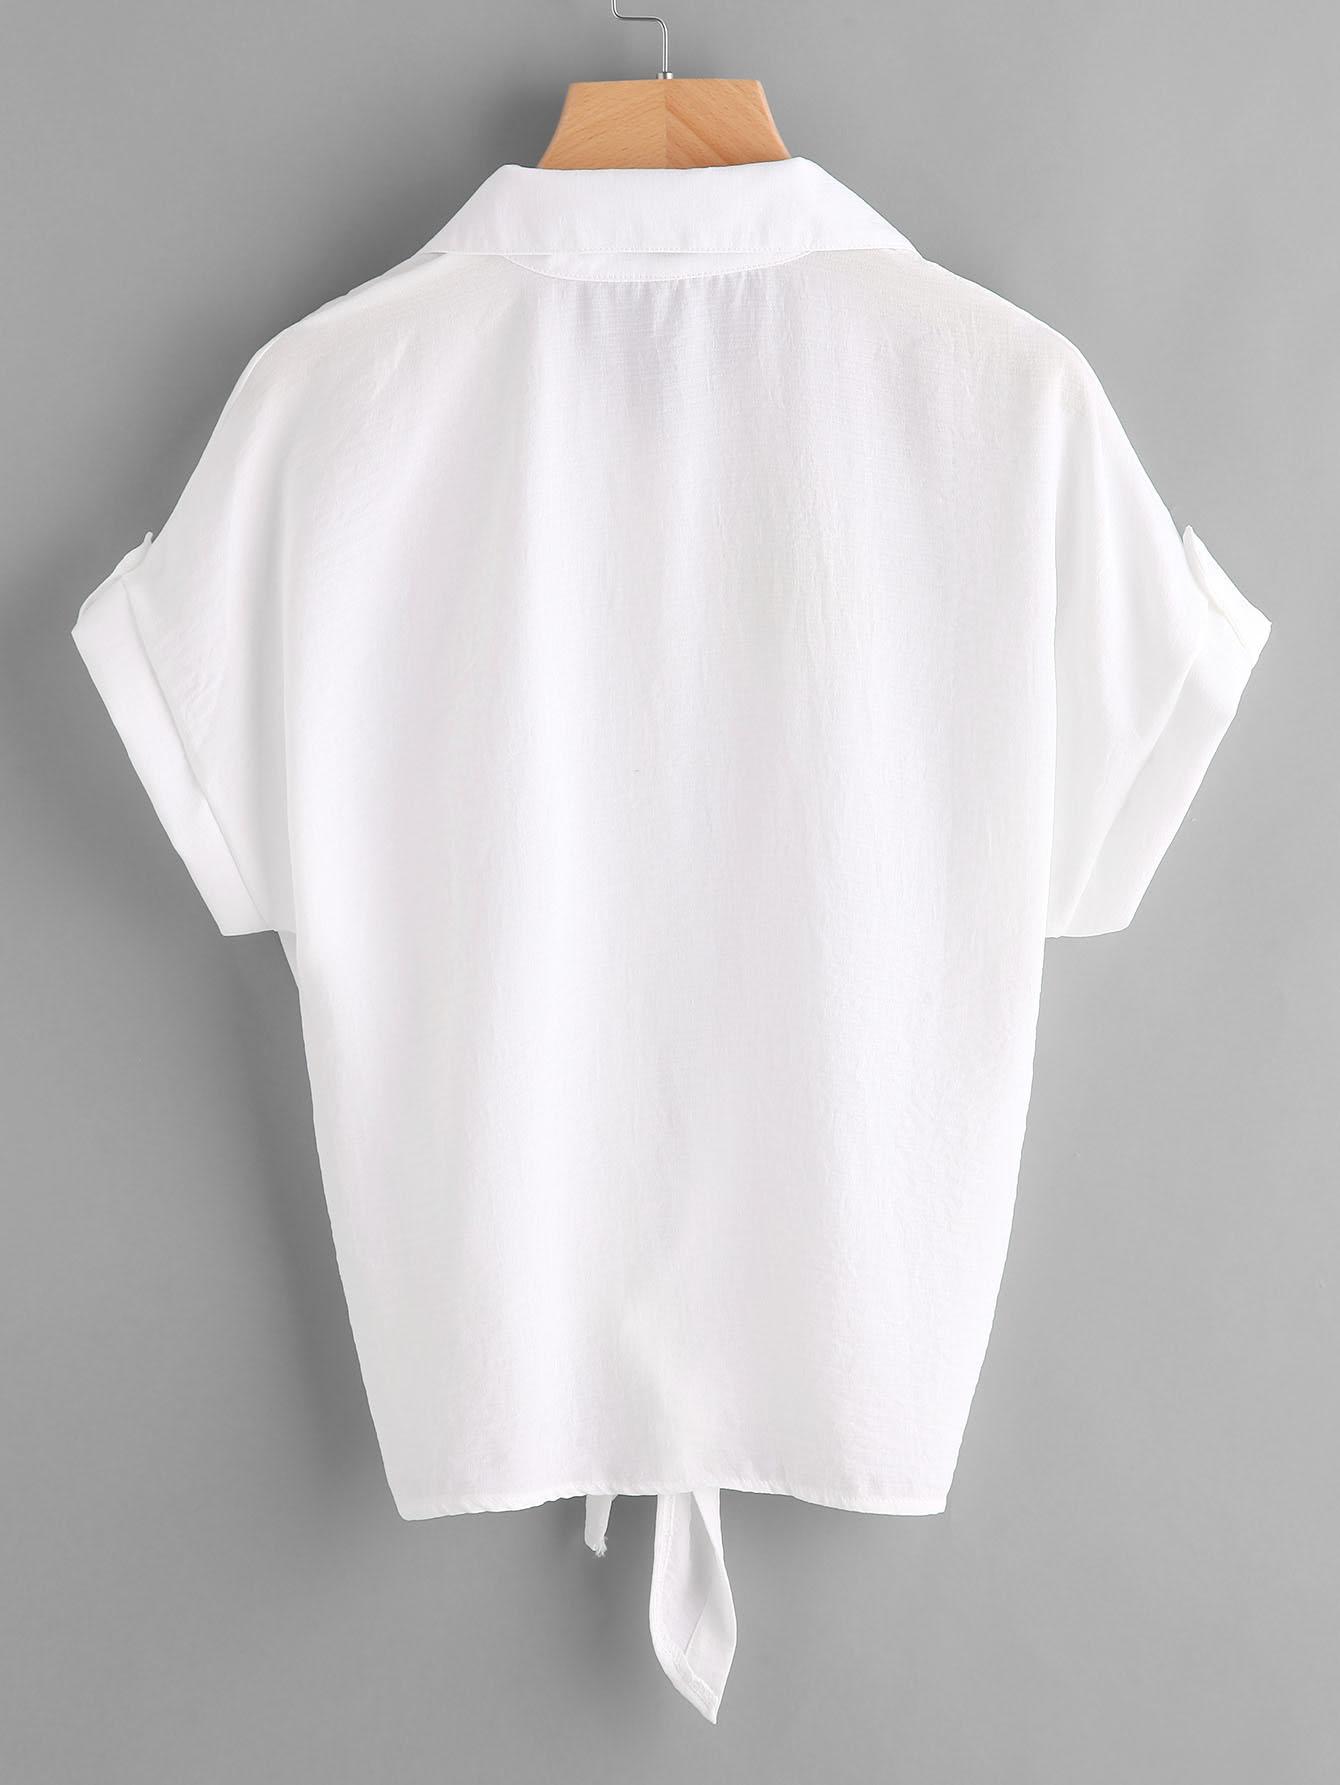 blouse170504006_2